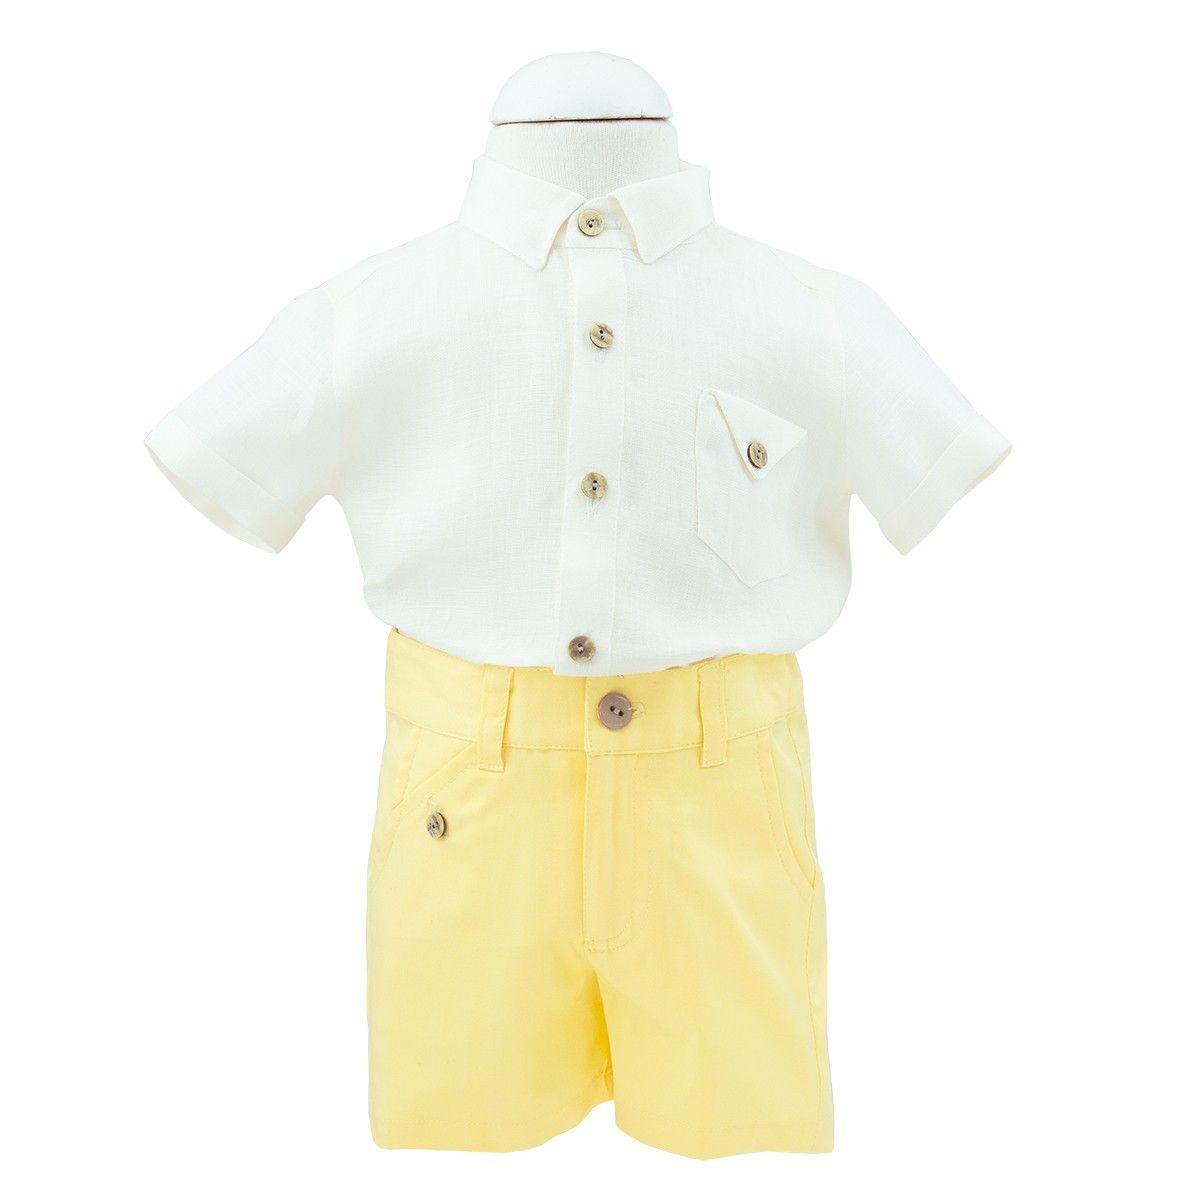 fa03a99a4 Conjunto para bebé beige amarillo de Kiriki